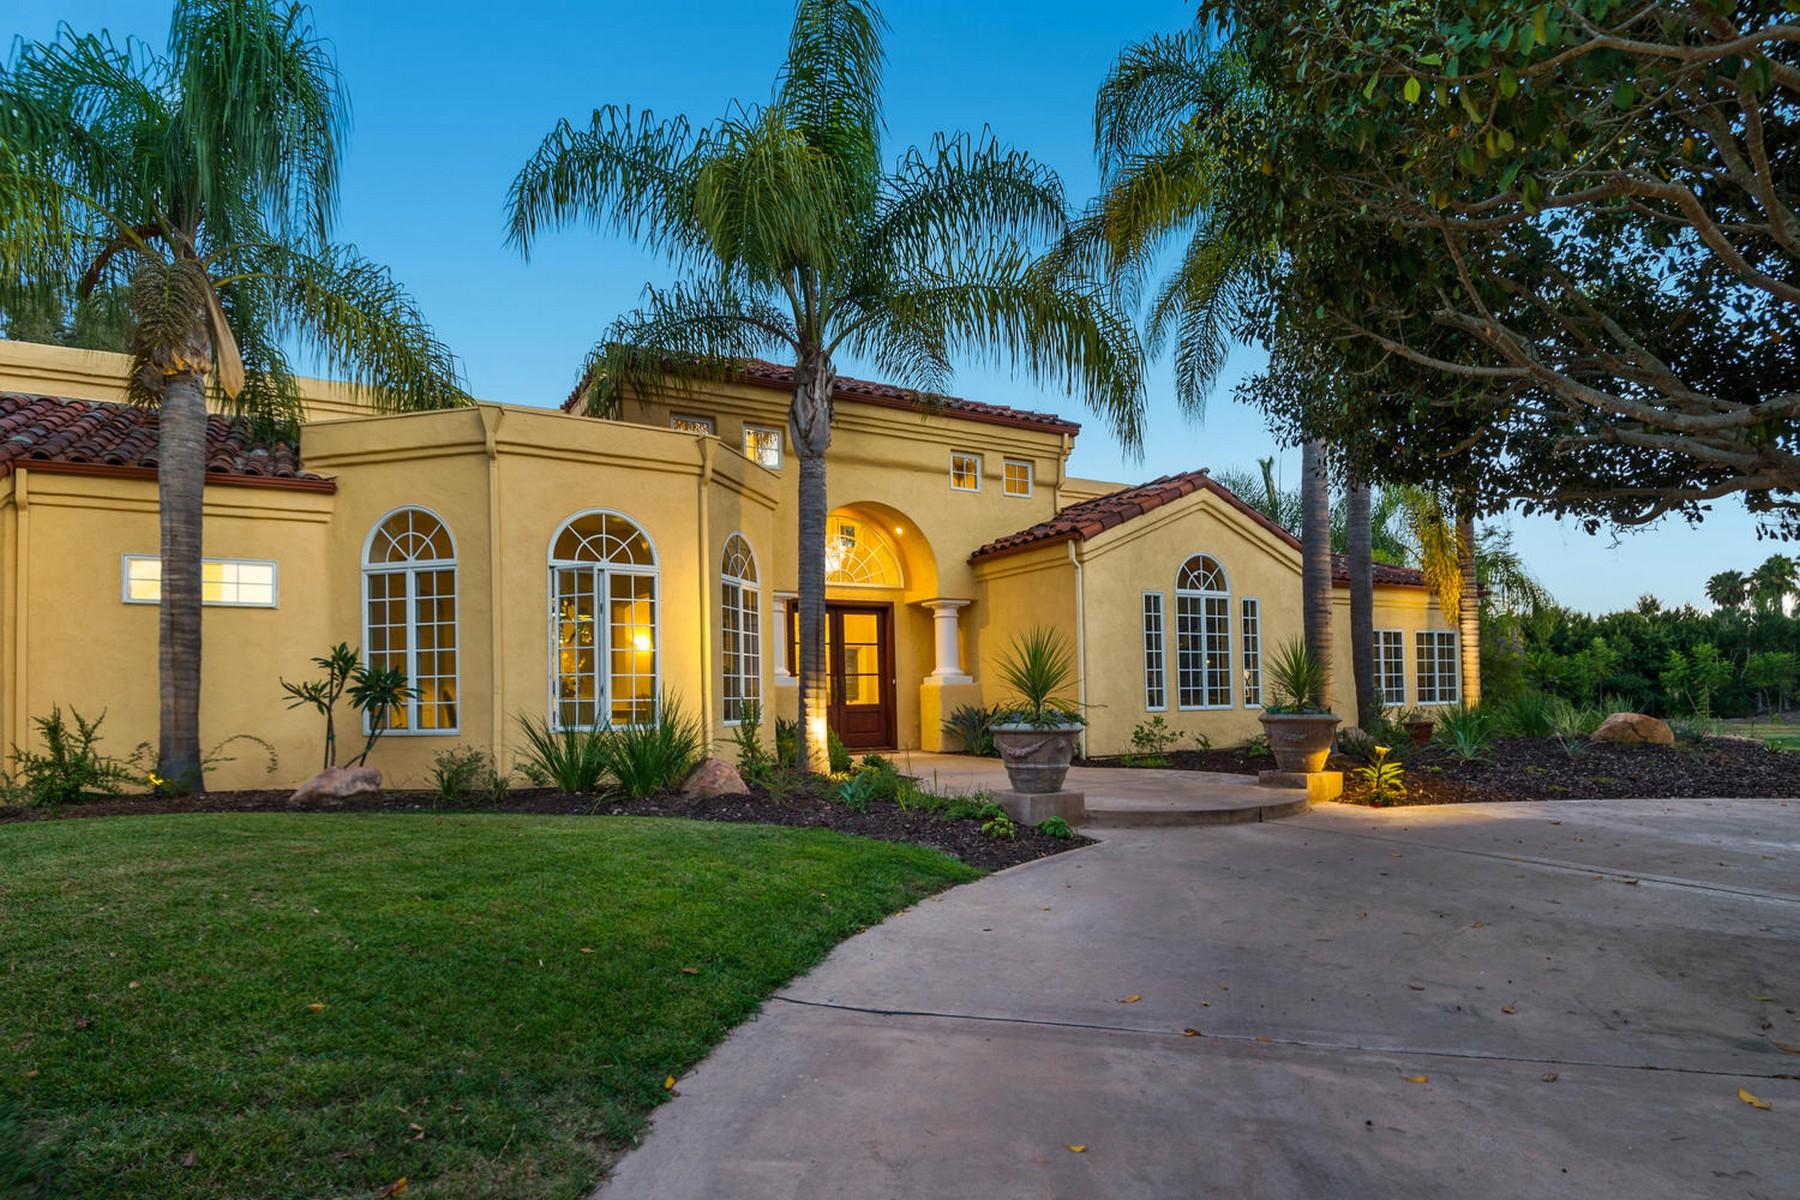 Moradia para Venda às 14955 Rancho Santa Fe Farms Road Rancho Santa Fe, Califórnia, 92067 Estados Unidos